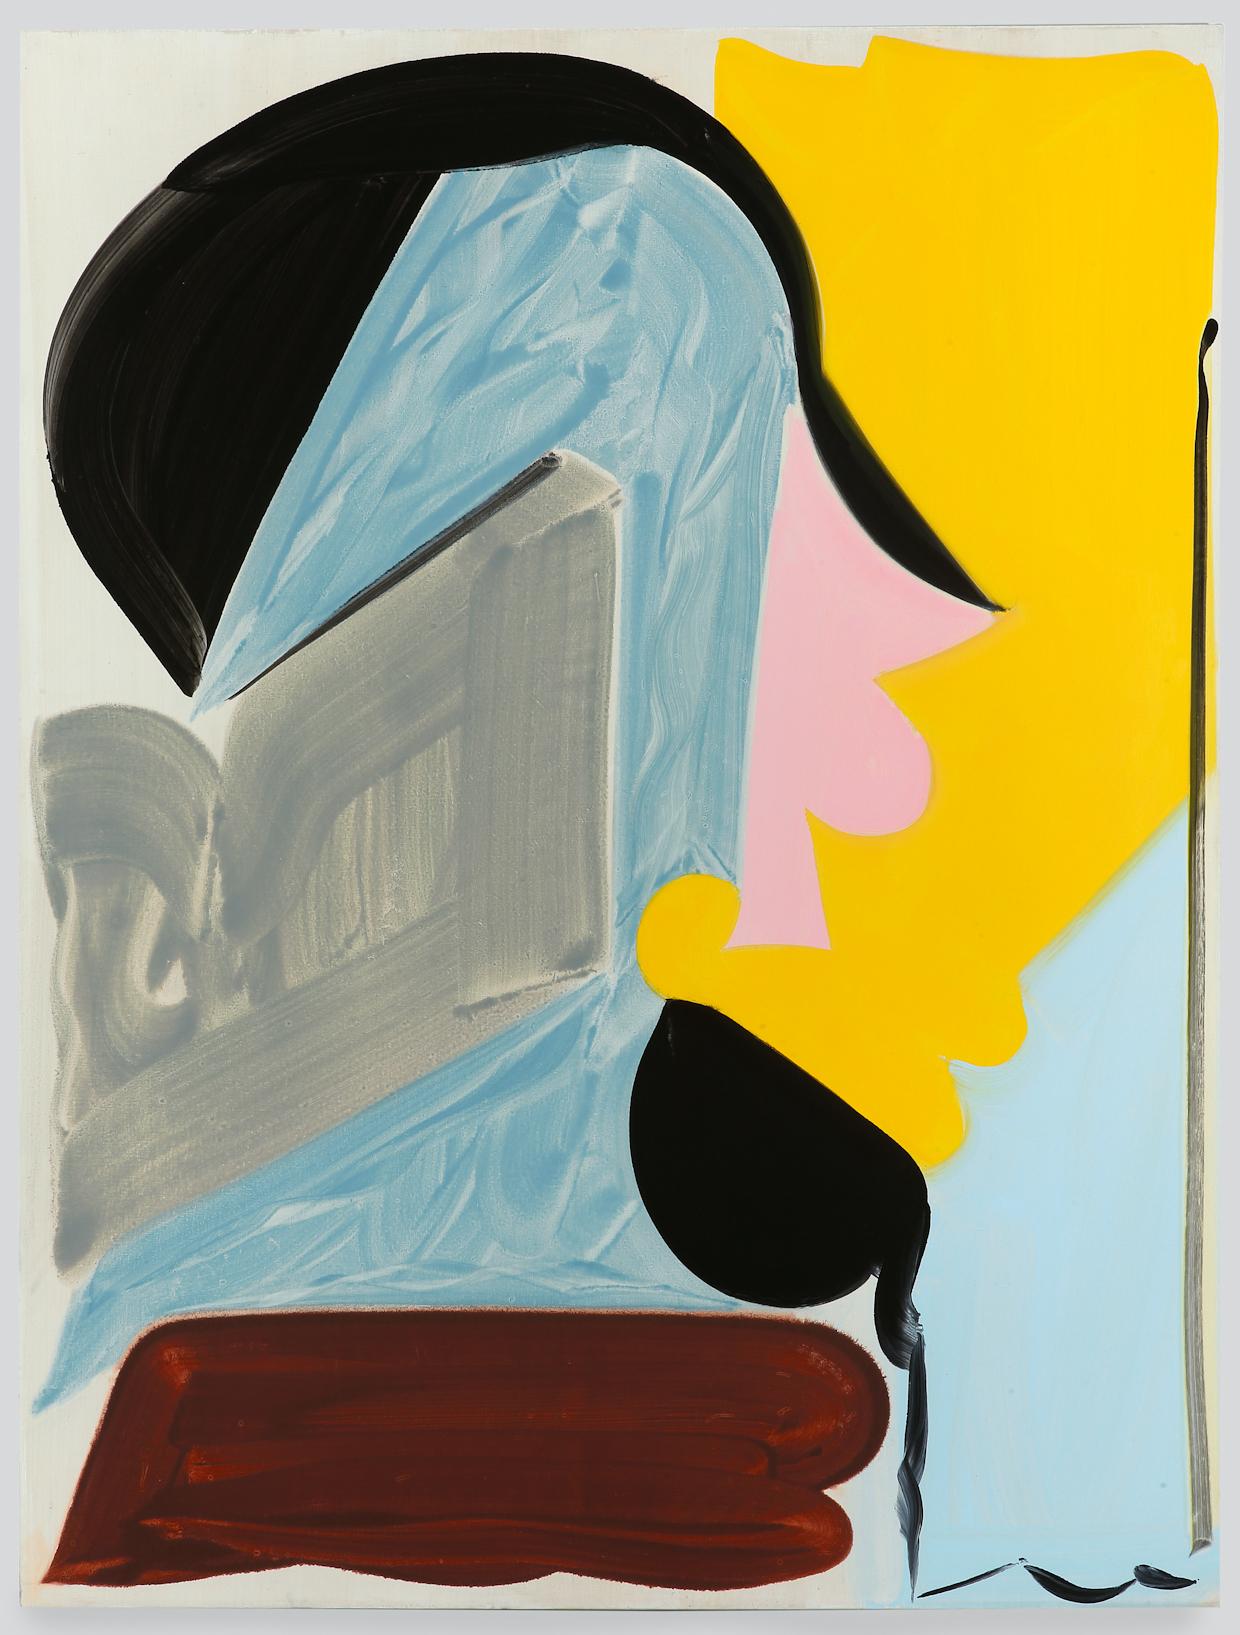 Patricia Treib, Ensemble, 2016, oil on canvas, 66 x 50 inches